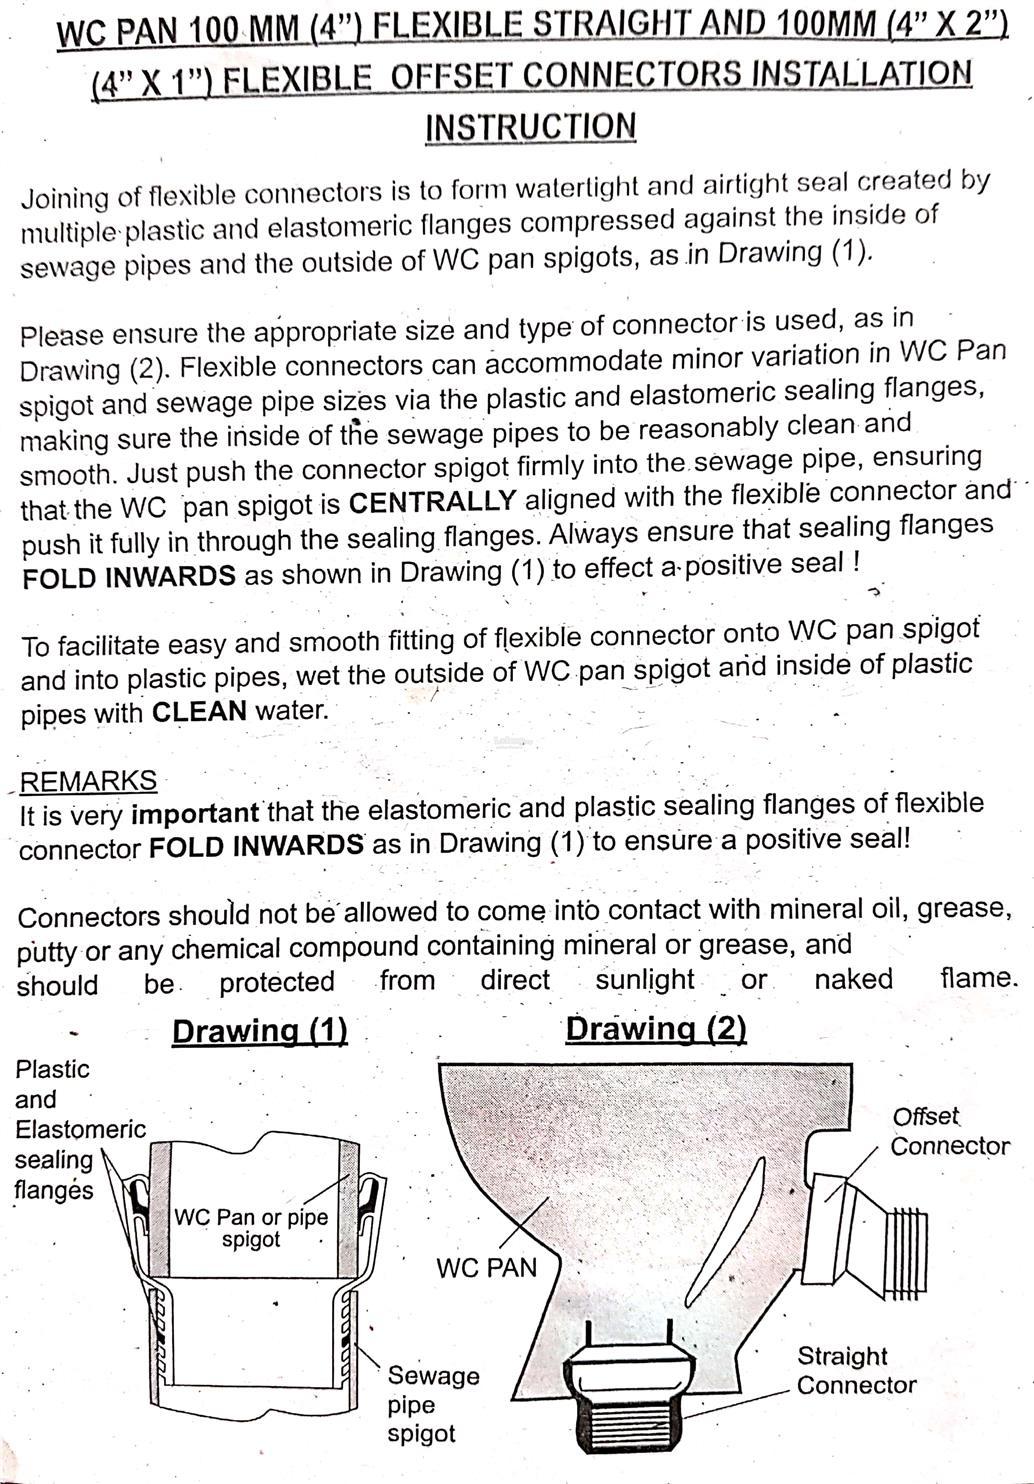 WC pan flexible straight connectors 4 ''